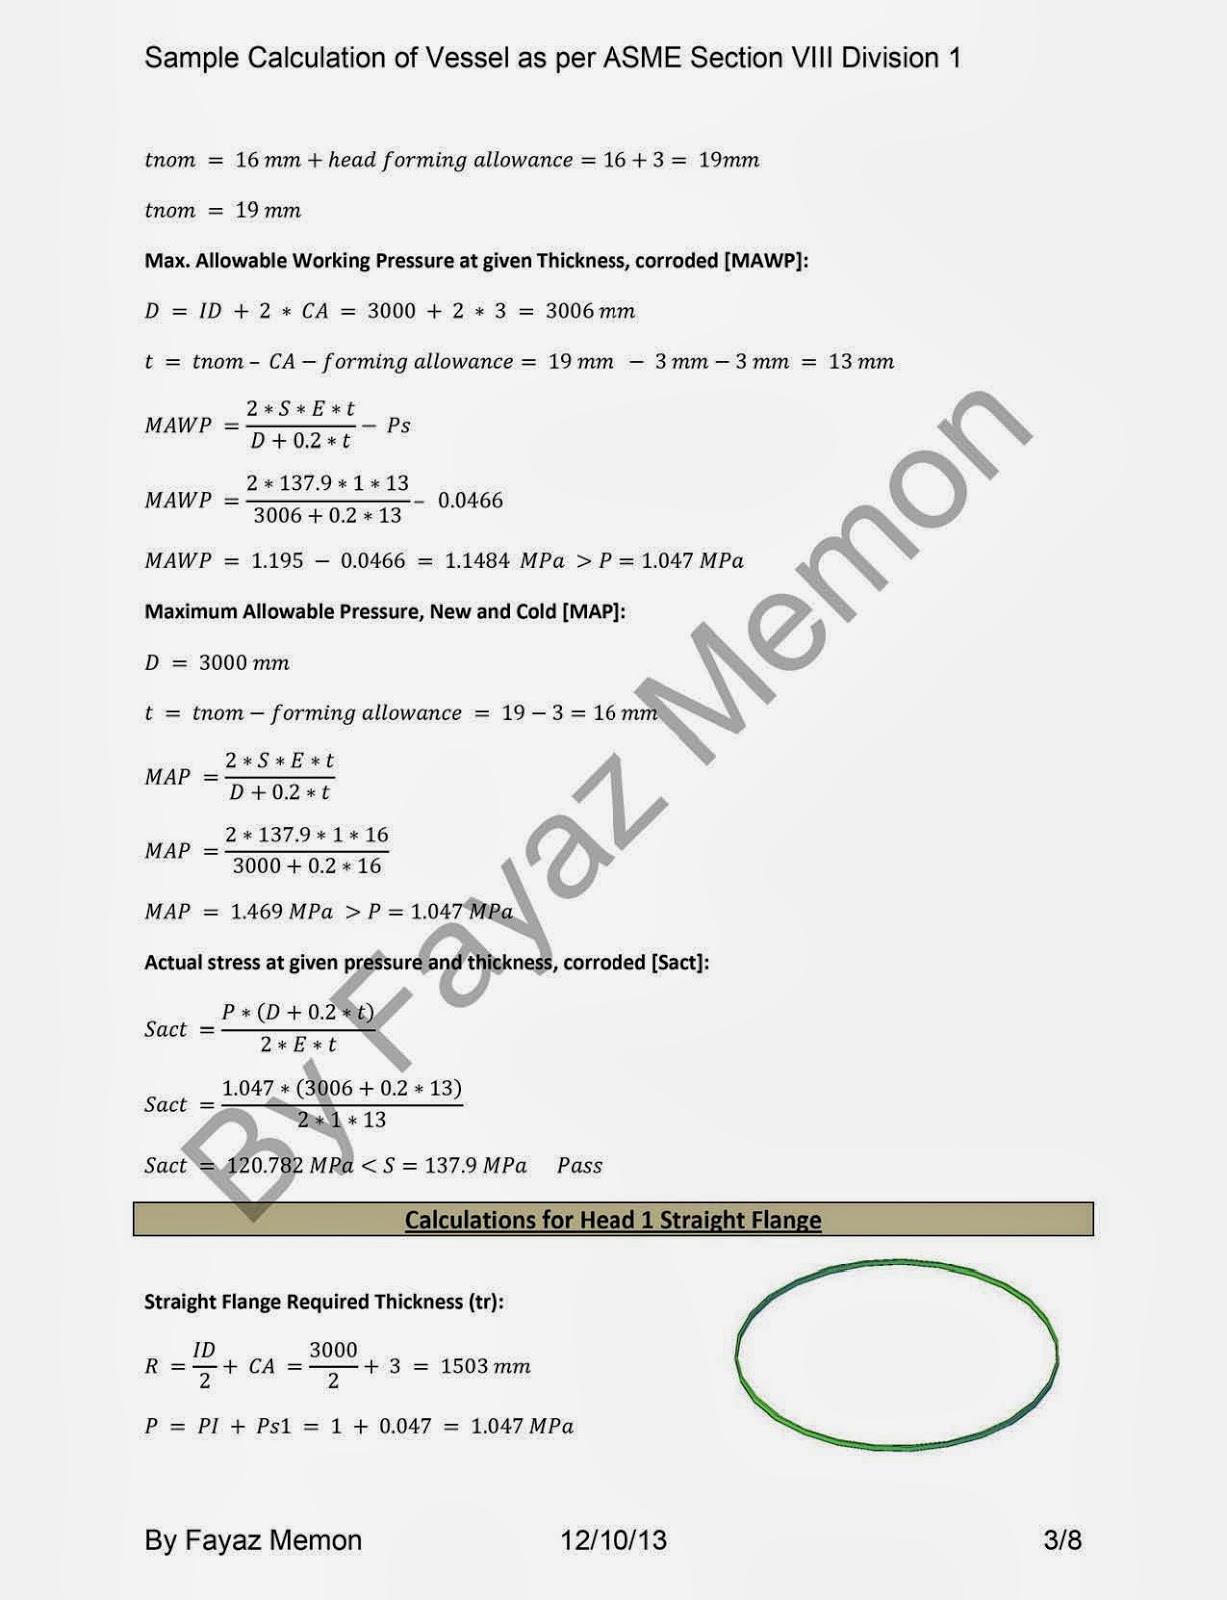 ASME Sec VIII Div 1 - 2013.pdf - 2013 ASME Boiler and